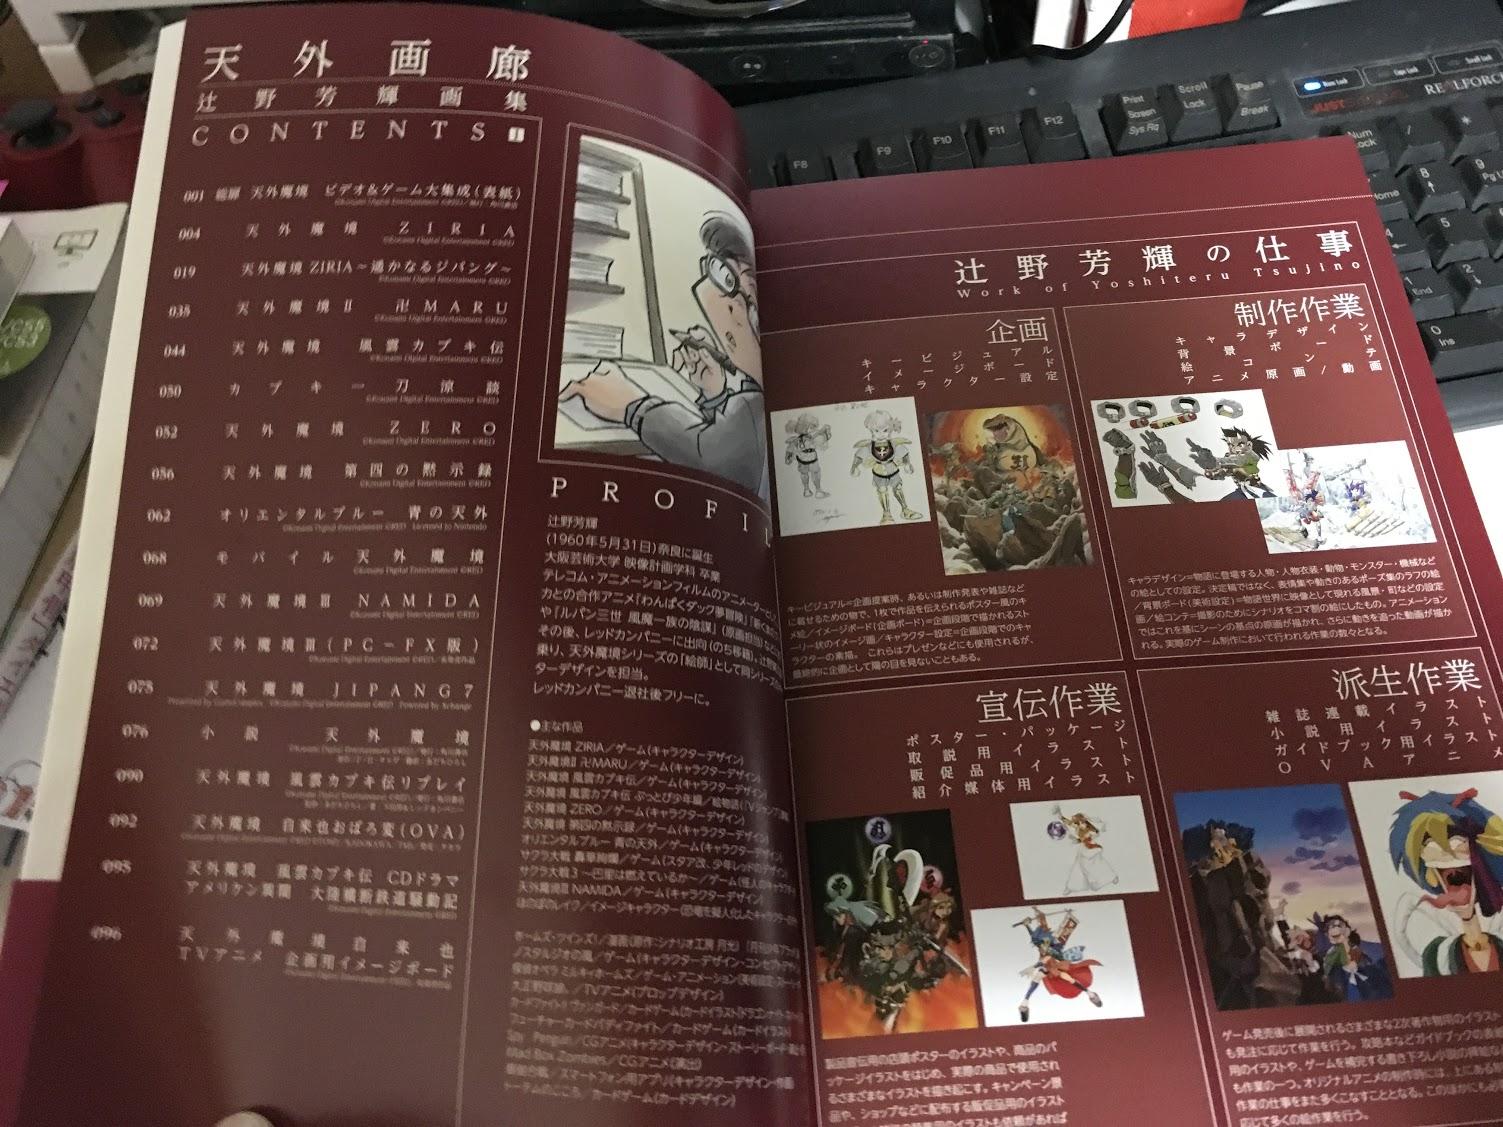 【PCエンジン書籍】電撃PCエンジン連載漫画が単行本化。「元祖水玉本舗 その1」